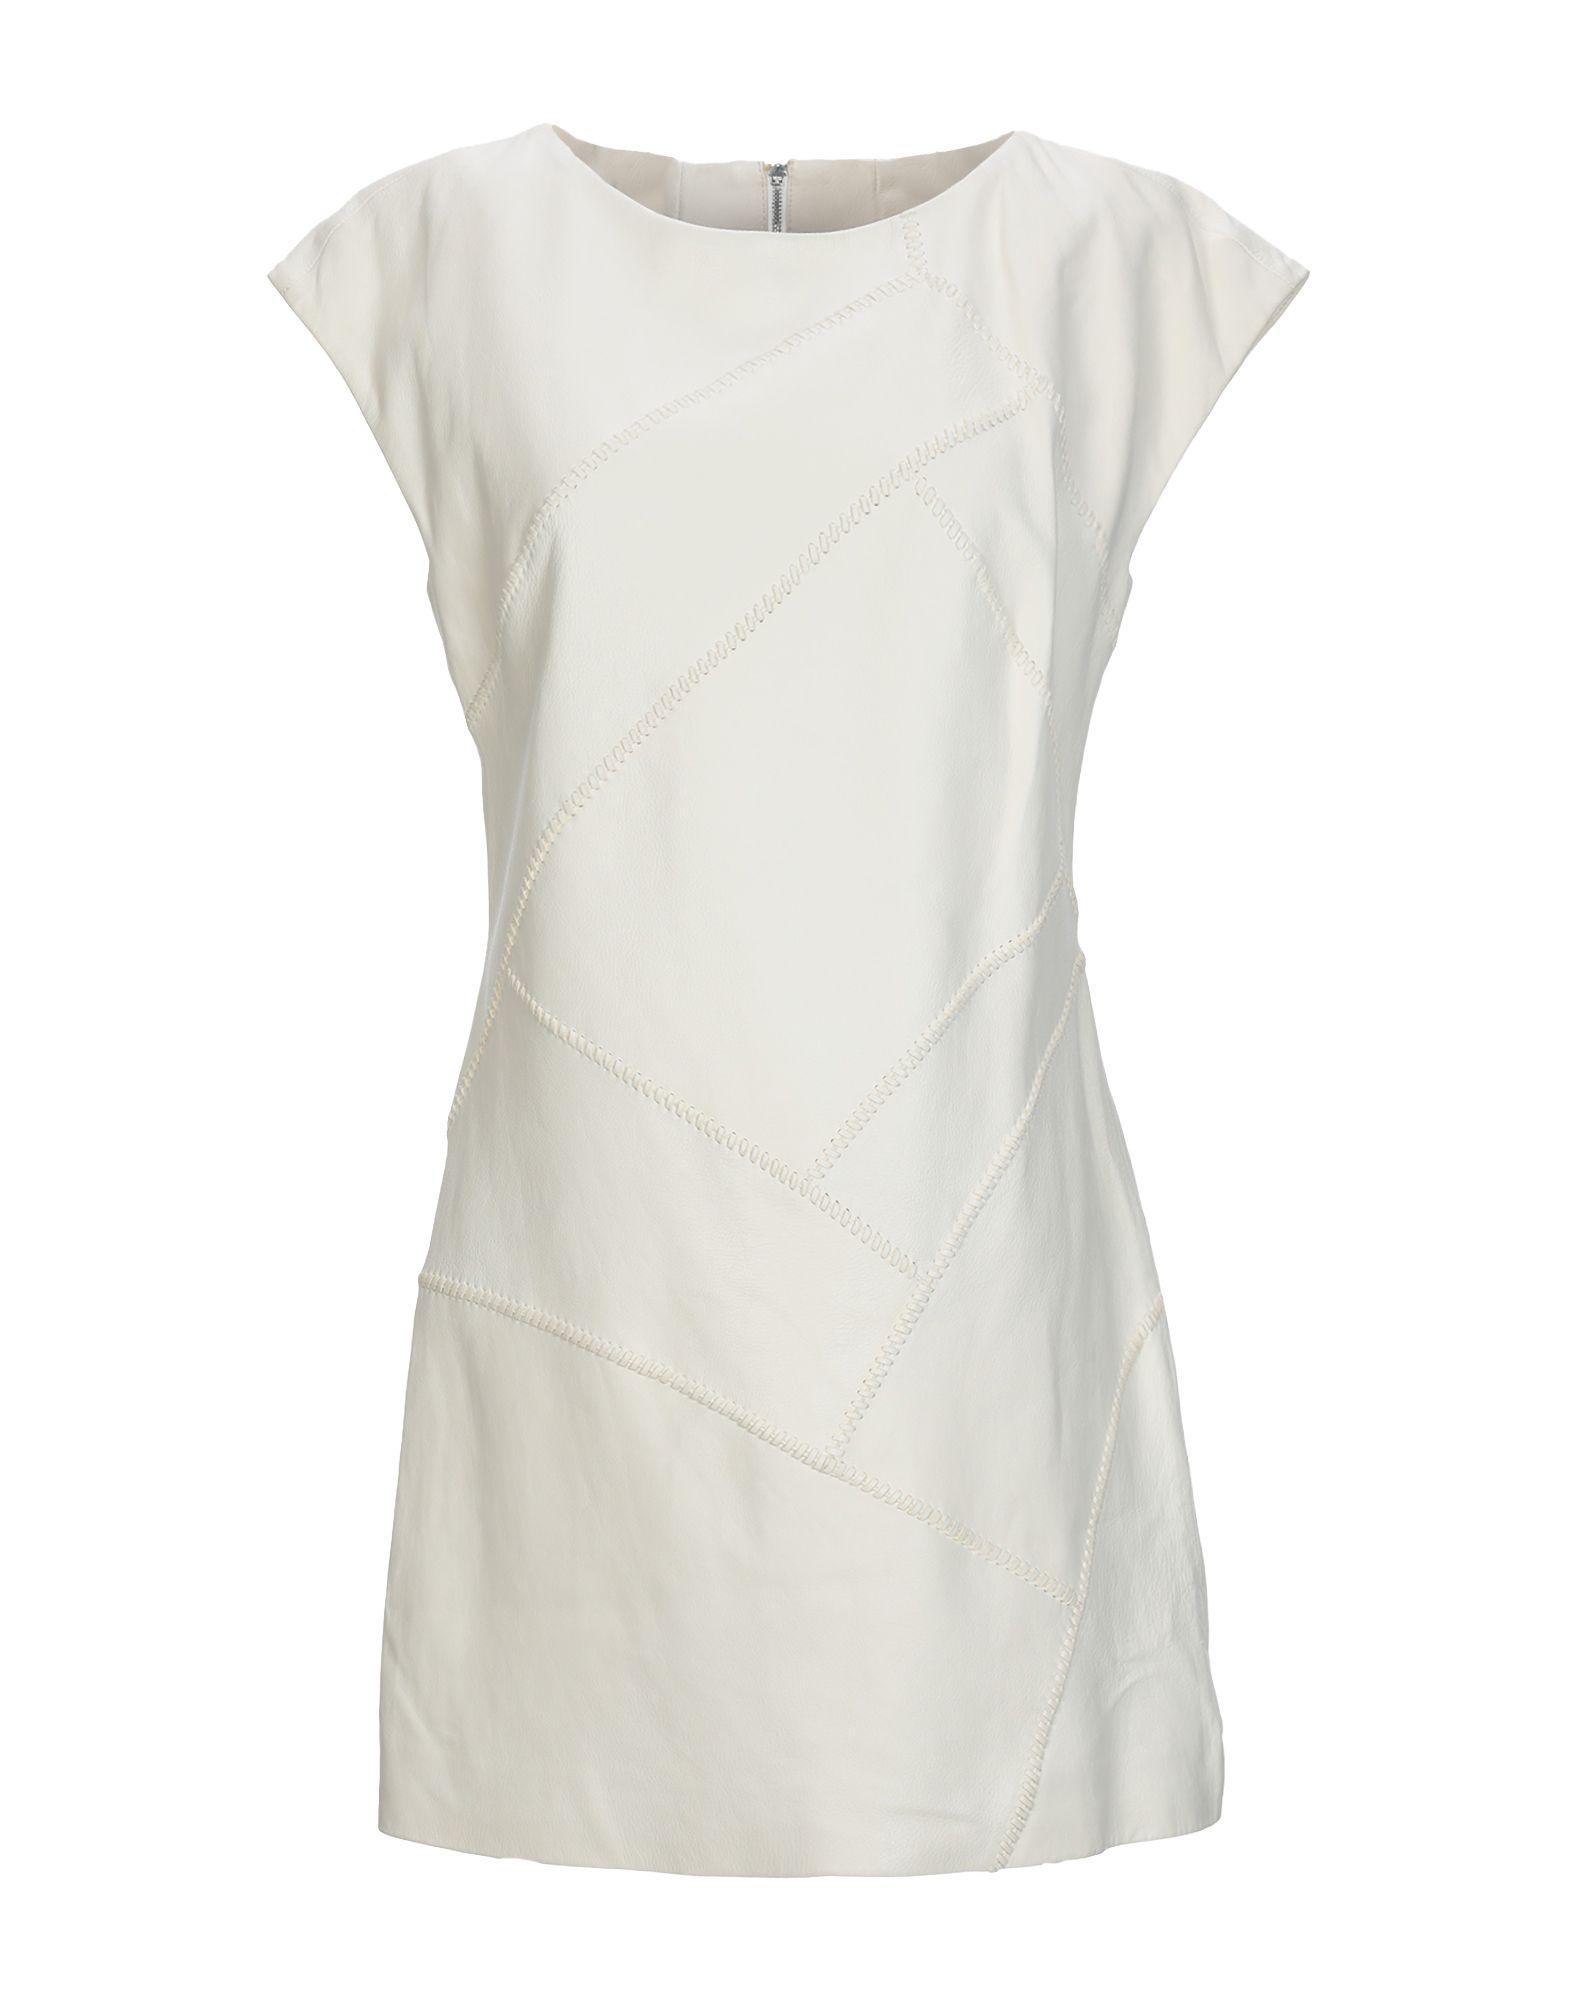 Фото - BARBARA BUI Короткое платье платье barbara bui платье